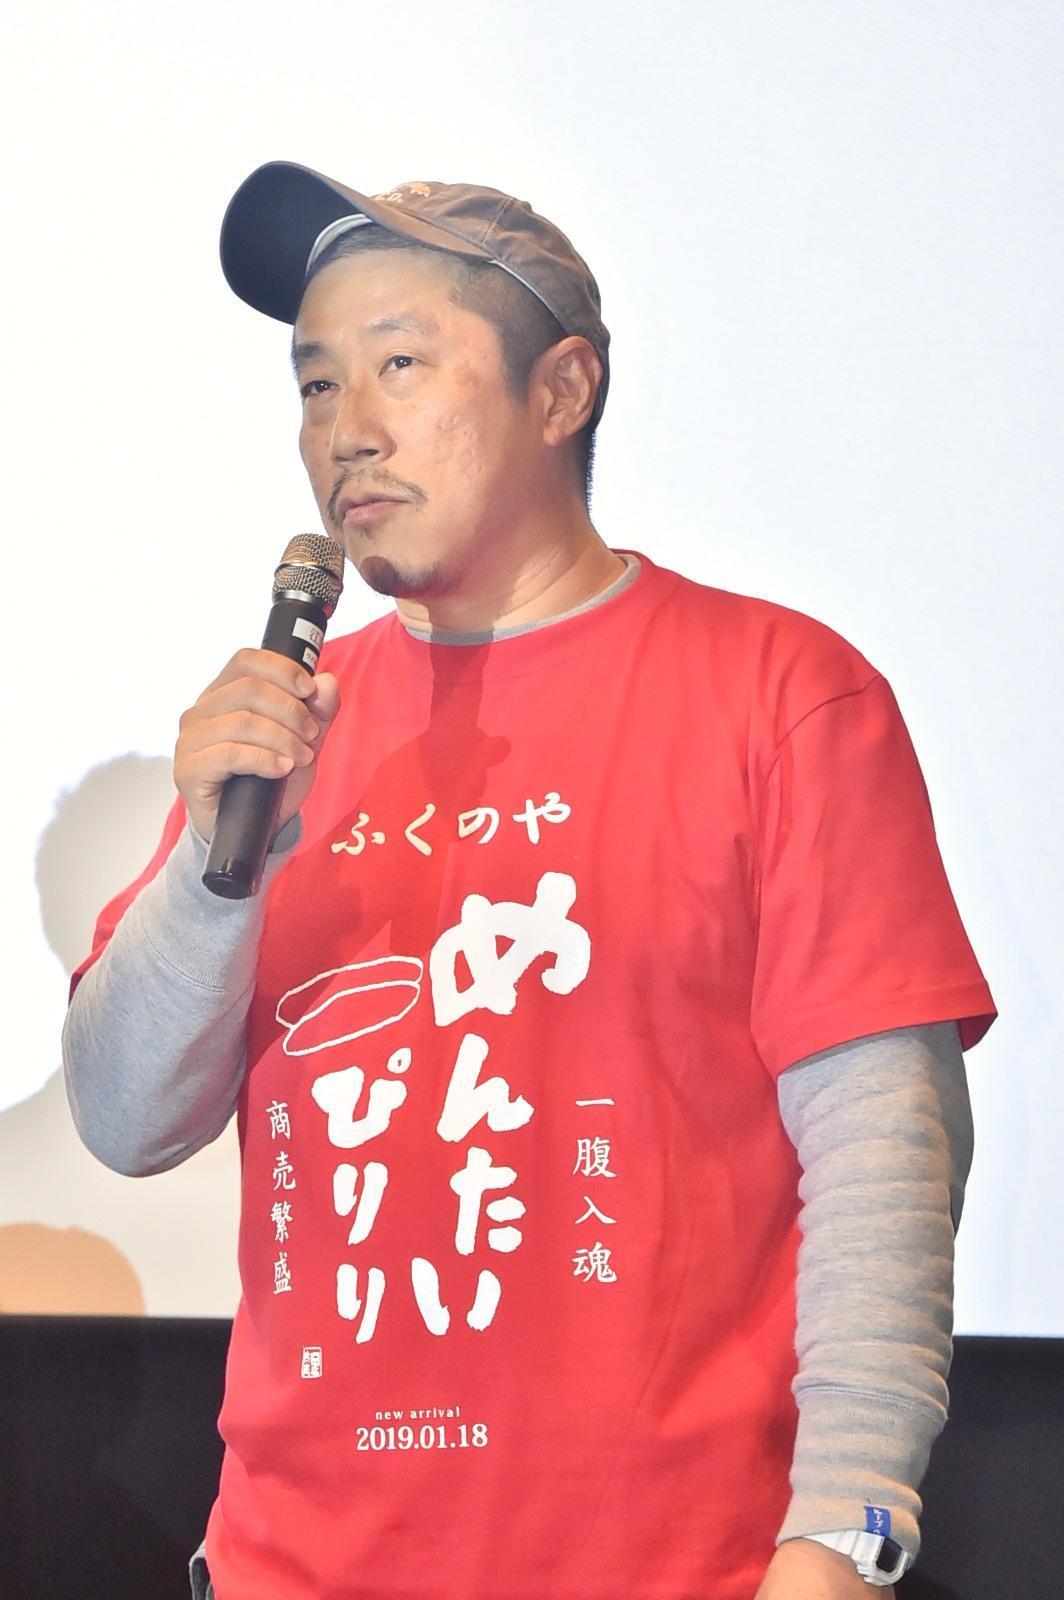 http://news.yoshimoto.co.jp/20190115124716-dab6f45de13e1278557b306c36d5325eecd9508d.jpg